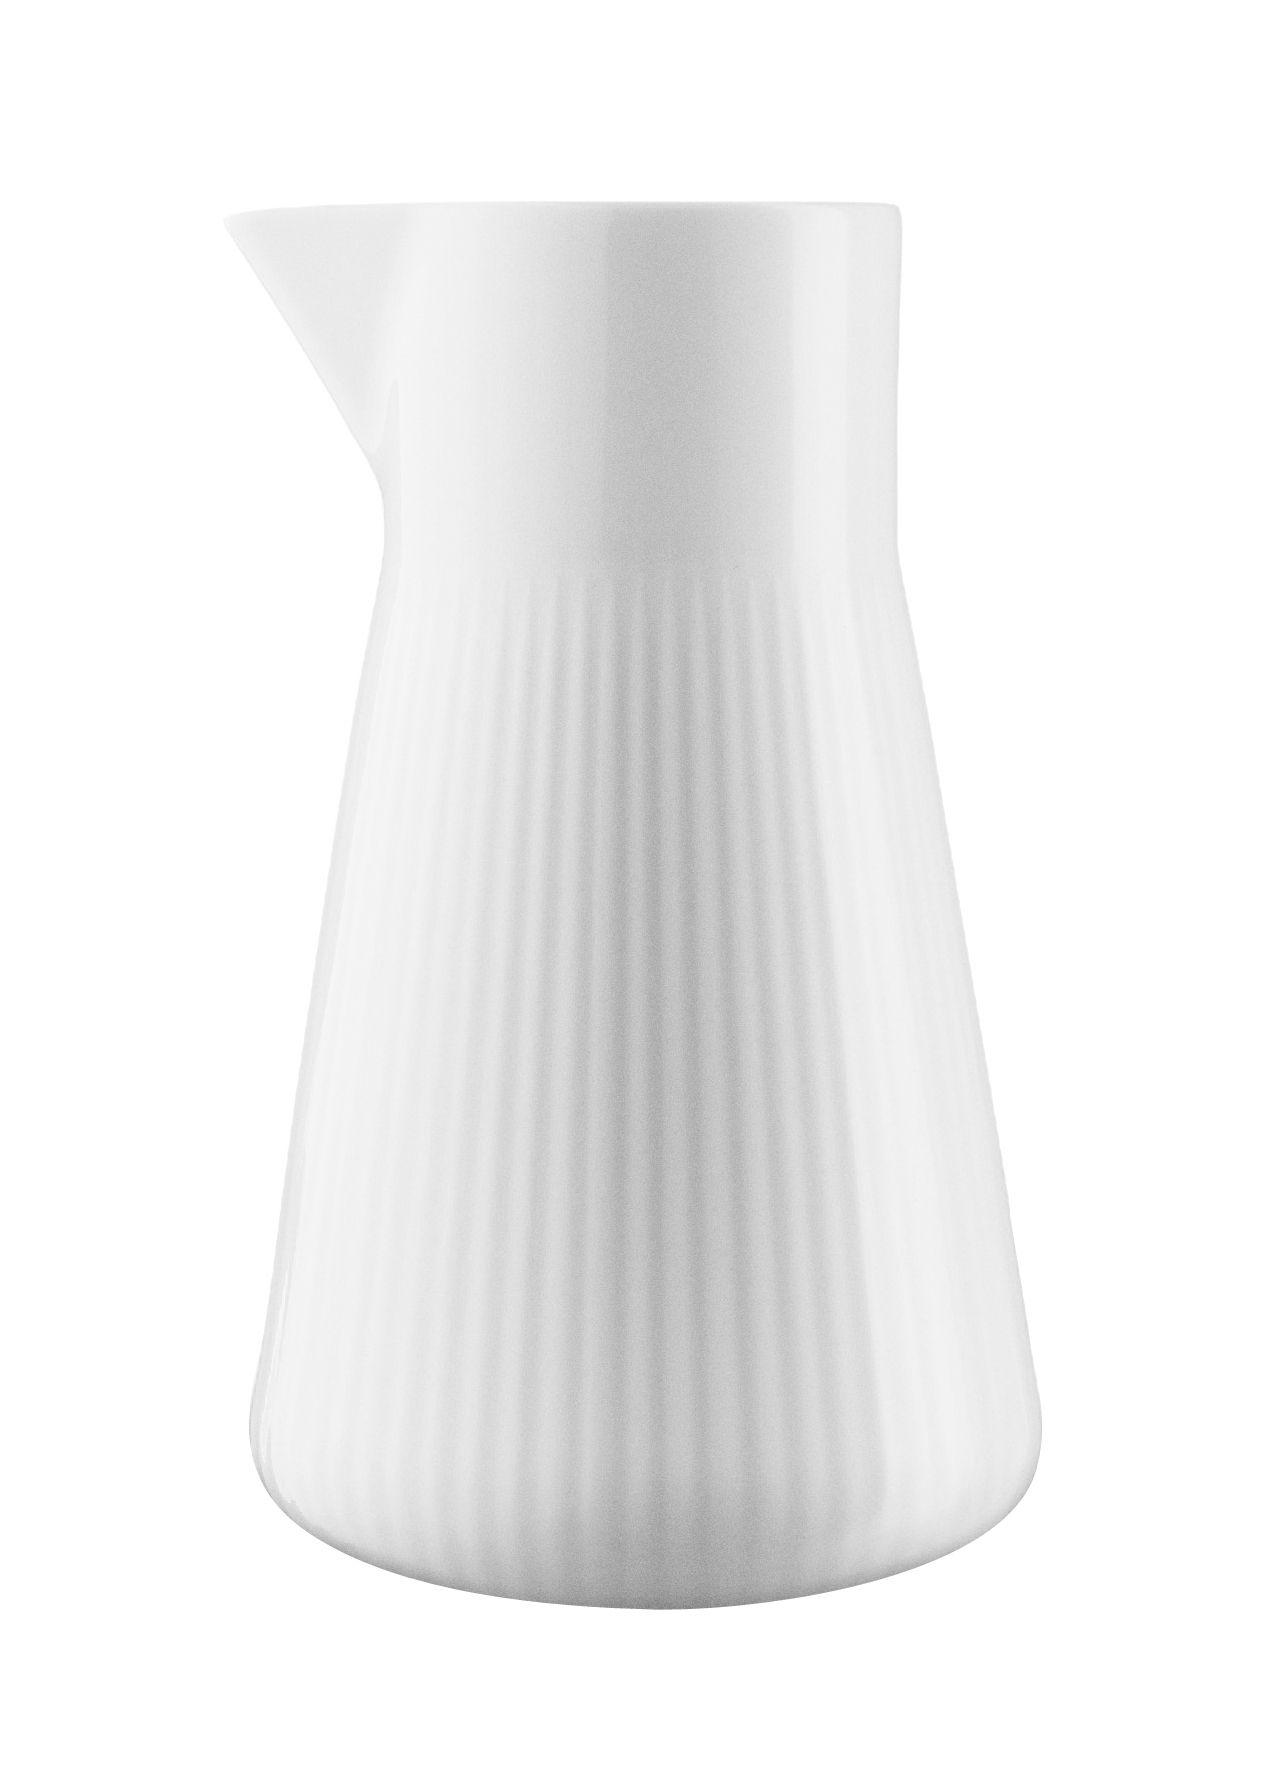 Tableware - Tea & Coffee Accessories - Legio Nova Milk pot - /  15 cl by Eva Trio - White - High quality porcelain